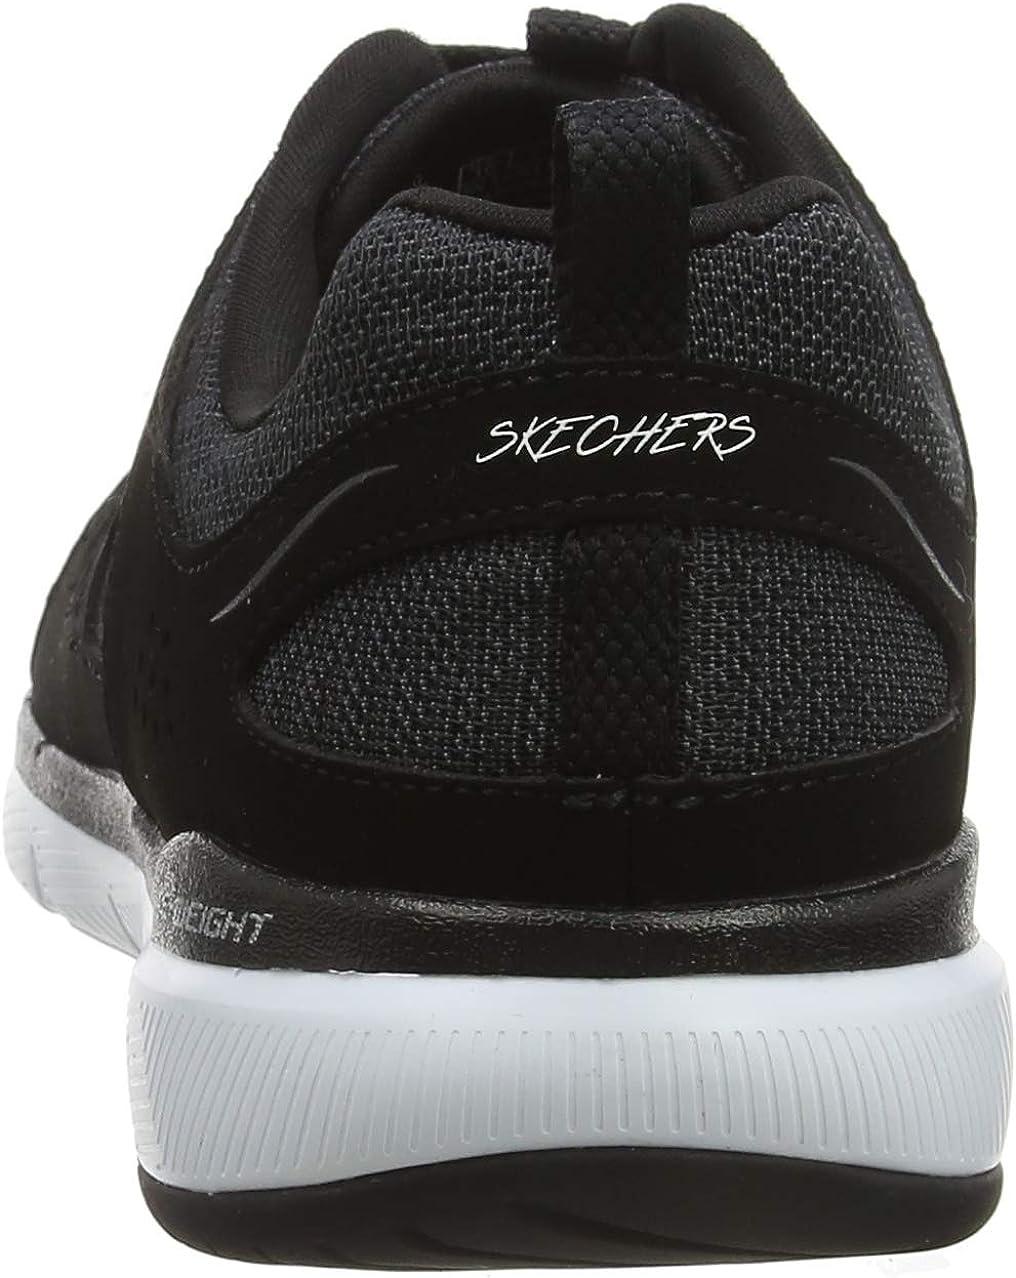 Skechers Women's Flex Appeal 3.0-Billow Trainers Black Black Leather Mesh White Trim Bkw